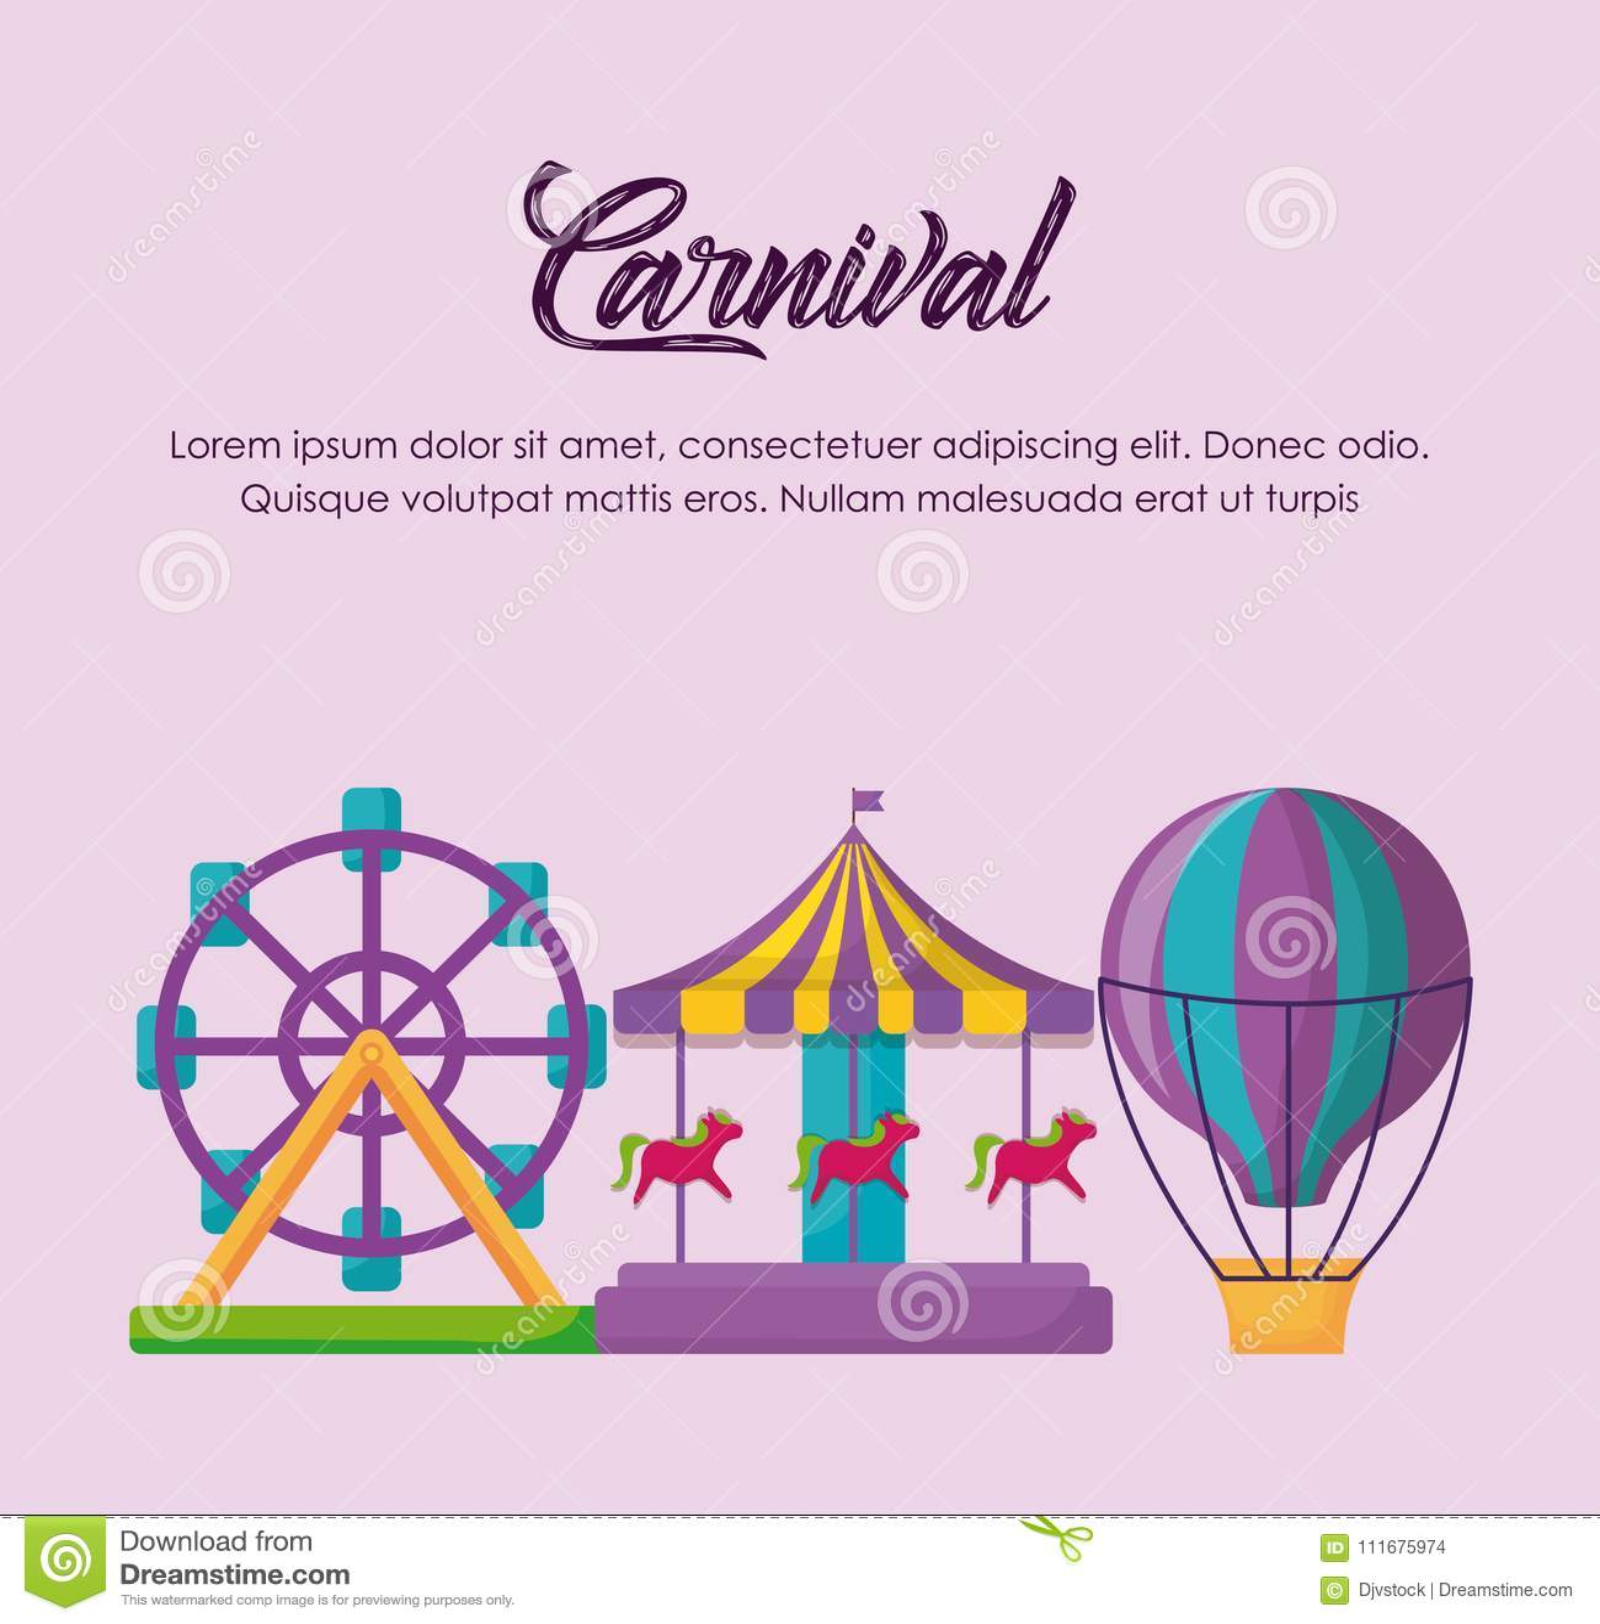 Carnival circus design